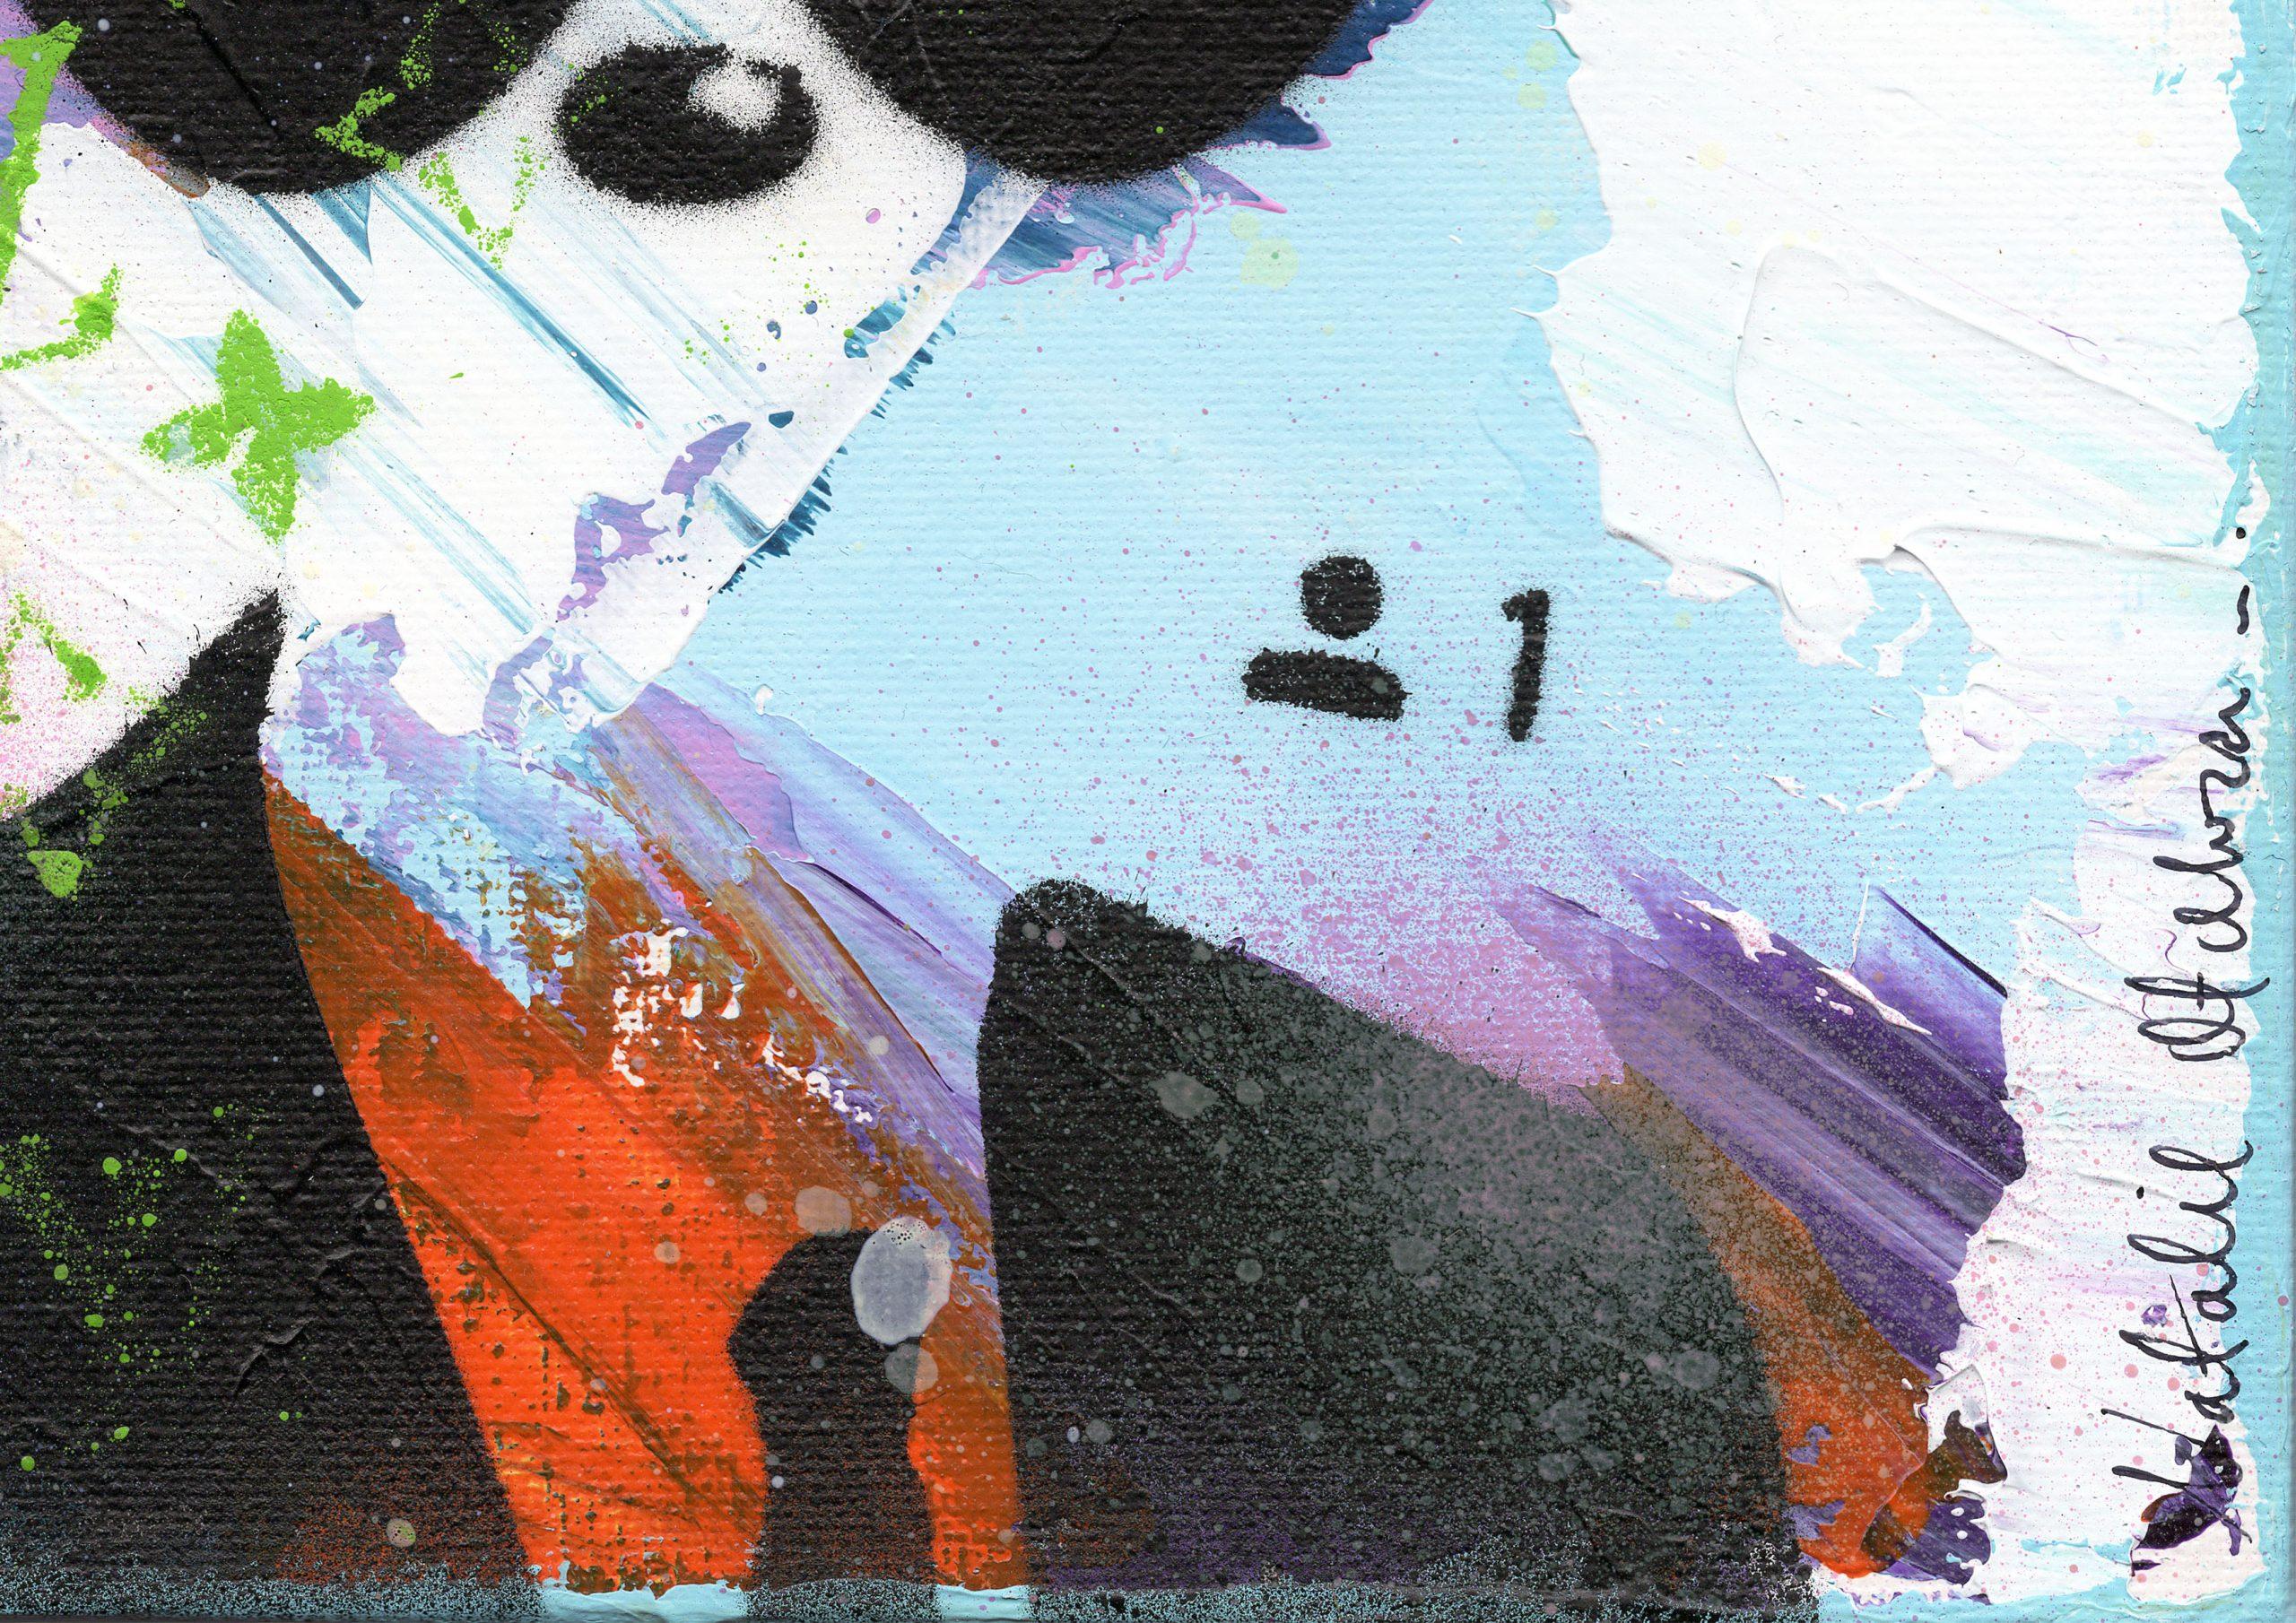 NATALIE-OTALORA-ART-GRAFFITI-MICKEY WANTS TO BE YOUR FRIEND-DETAIL3